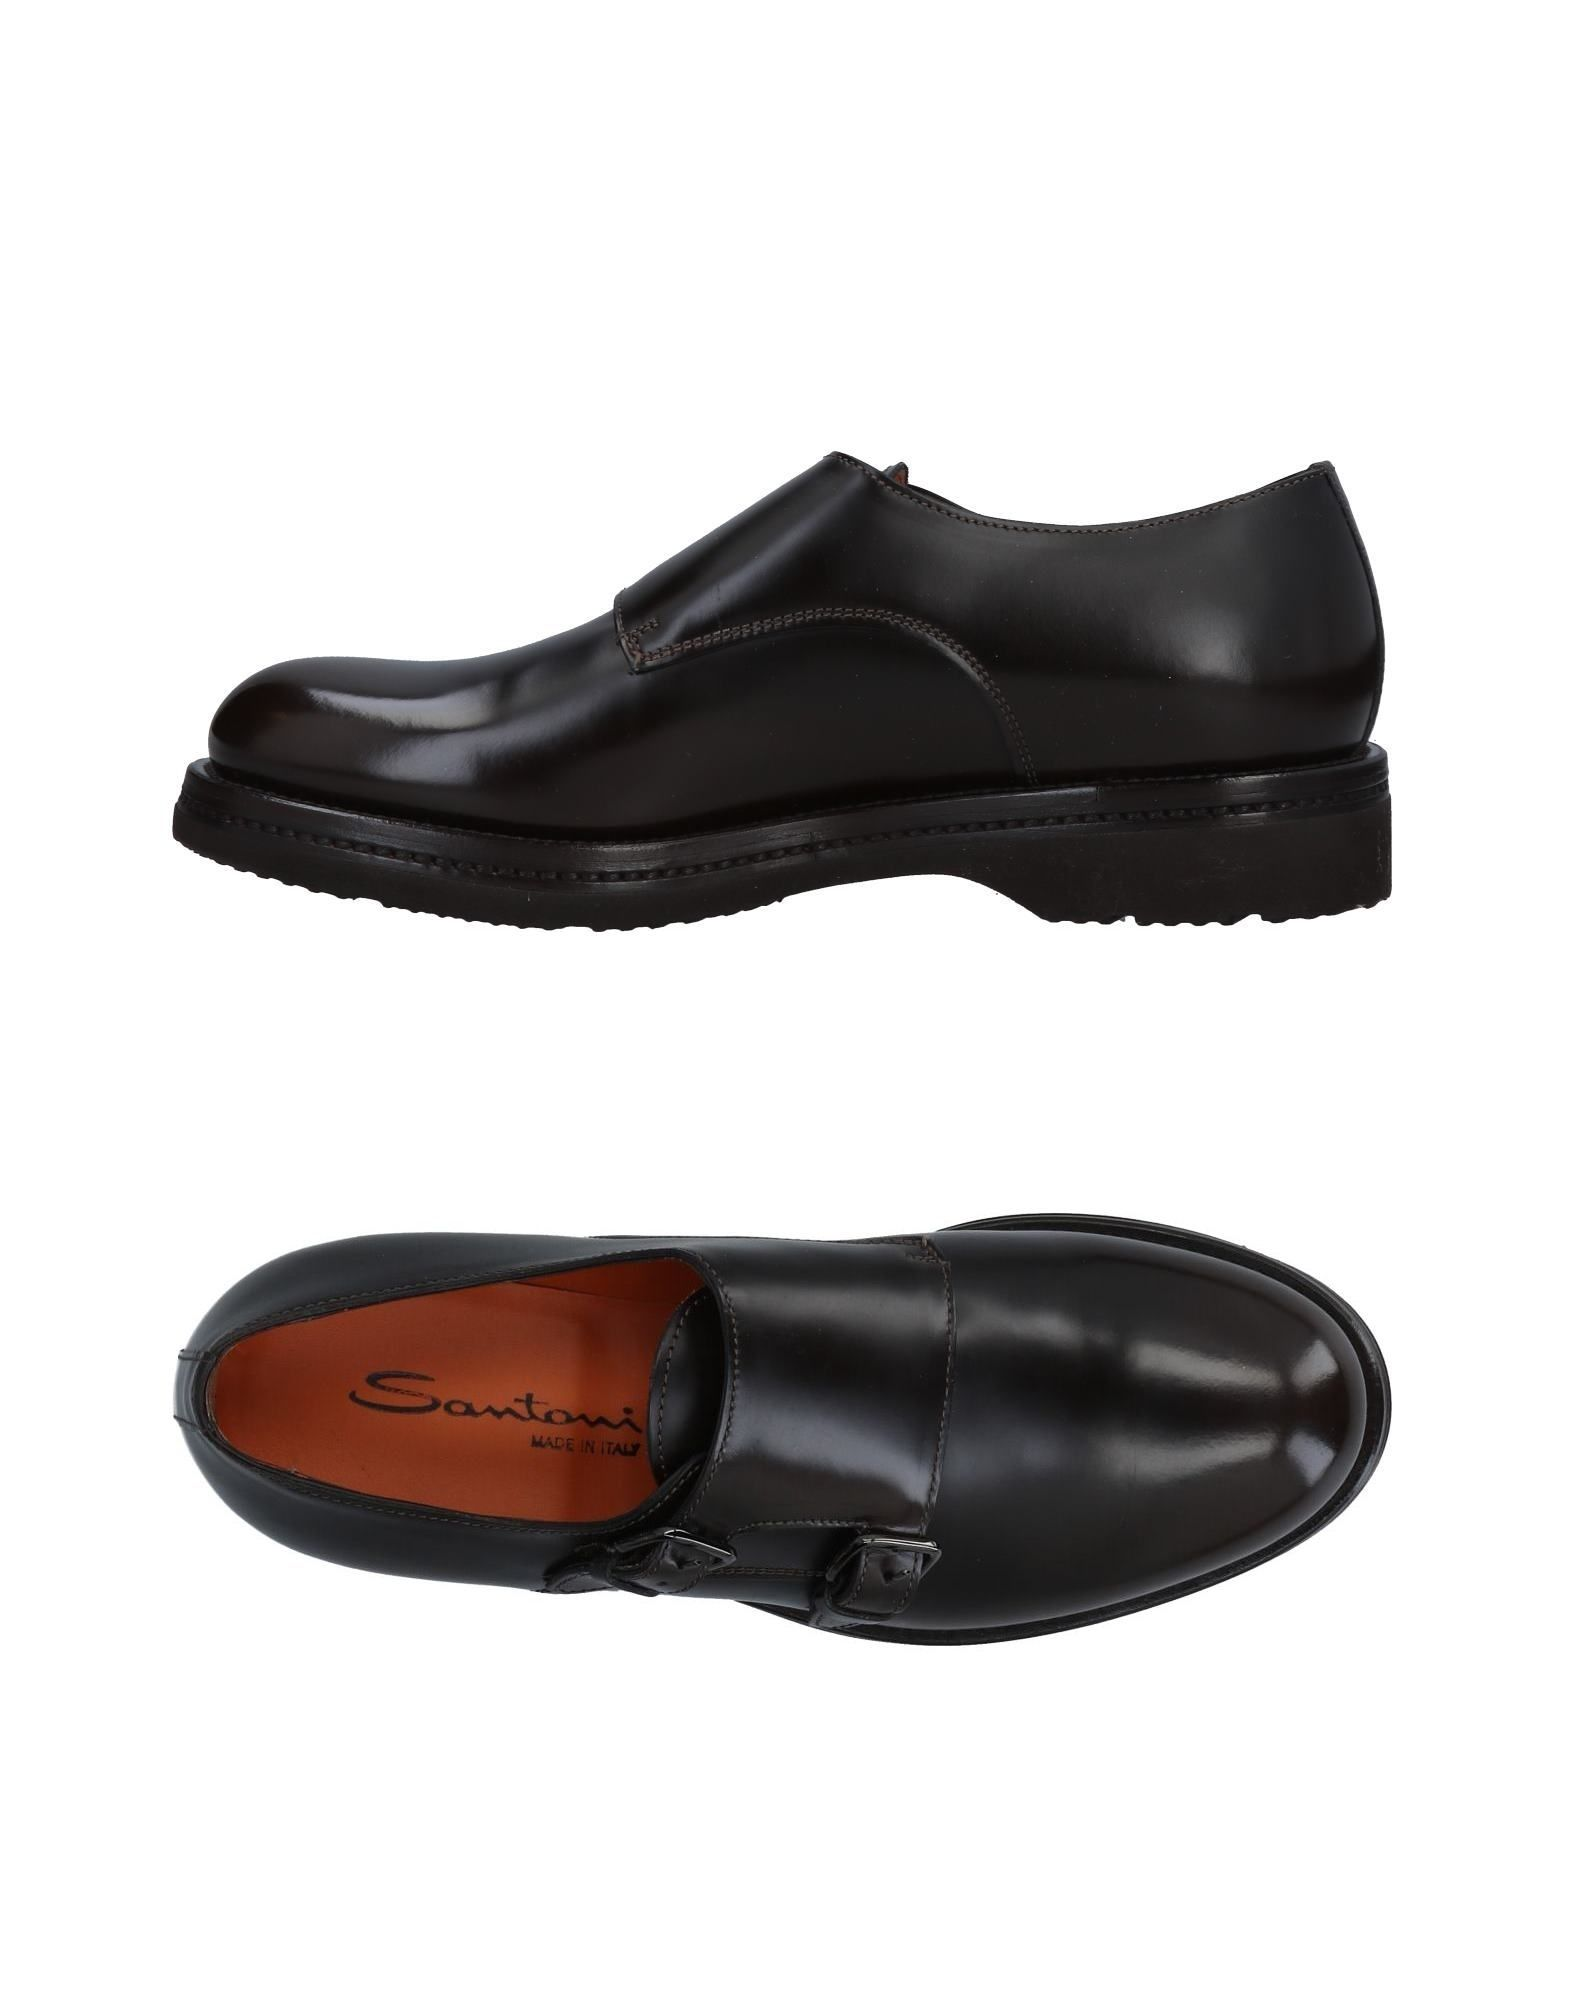 Santoni Mokassins Herren Herren Mokassins  11493025FC Heiße Schuhe dfb085